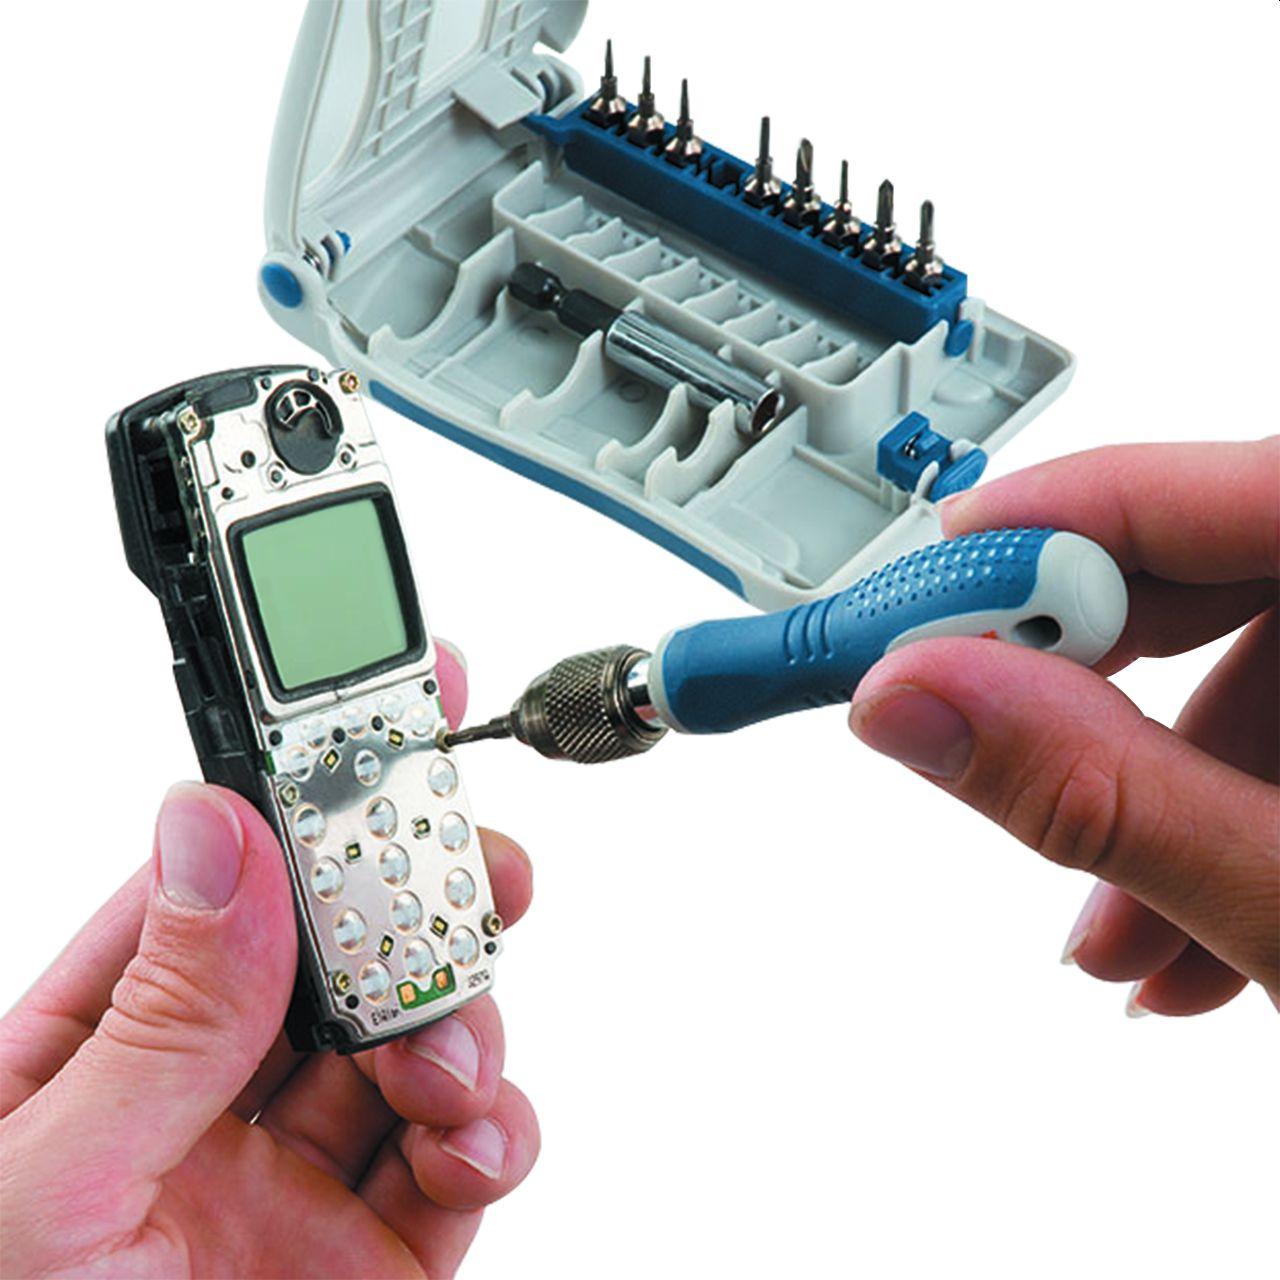 kwb 11 tlg. Präzisions-Mikro-Bit-Satz für elektronische Geräte